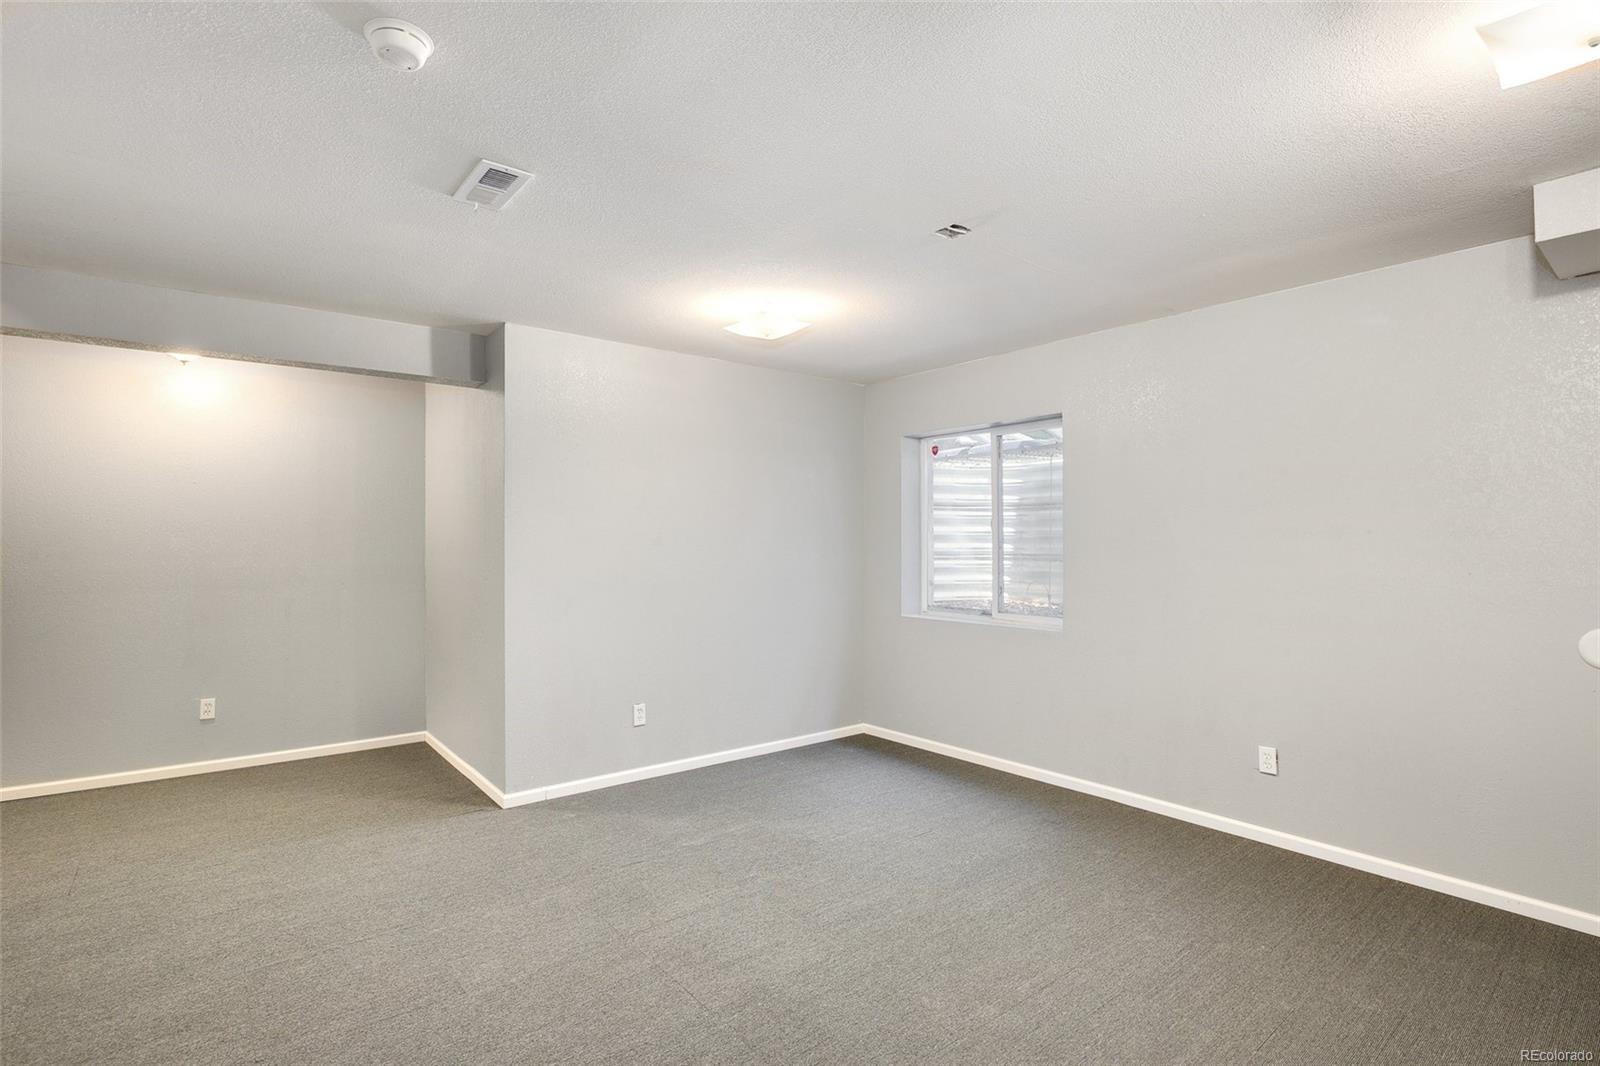 MLS# 3660864 - 27 - 13938 E 106th Place, Commerce City, CO 80022